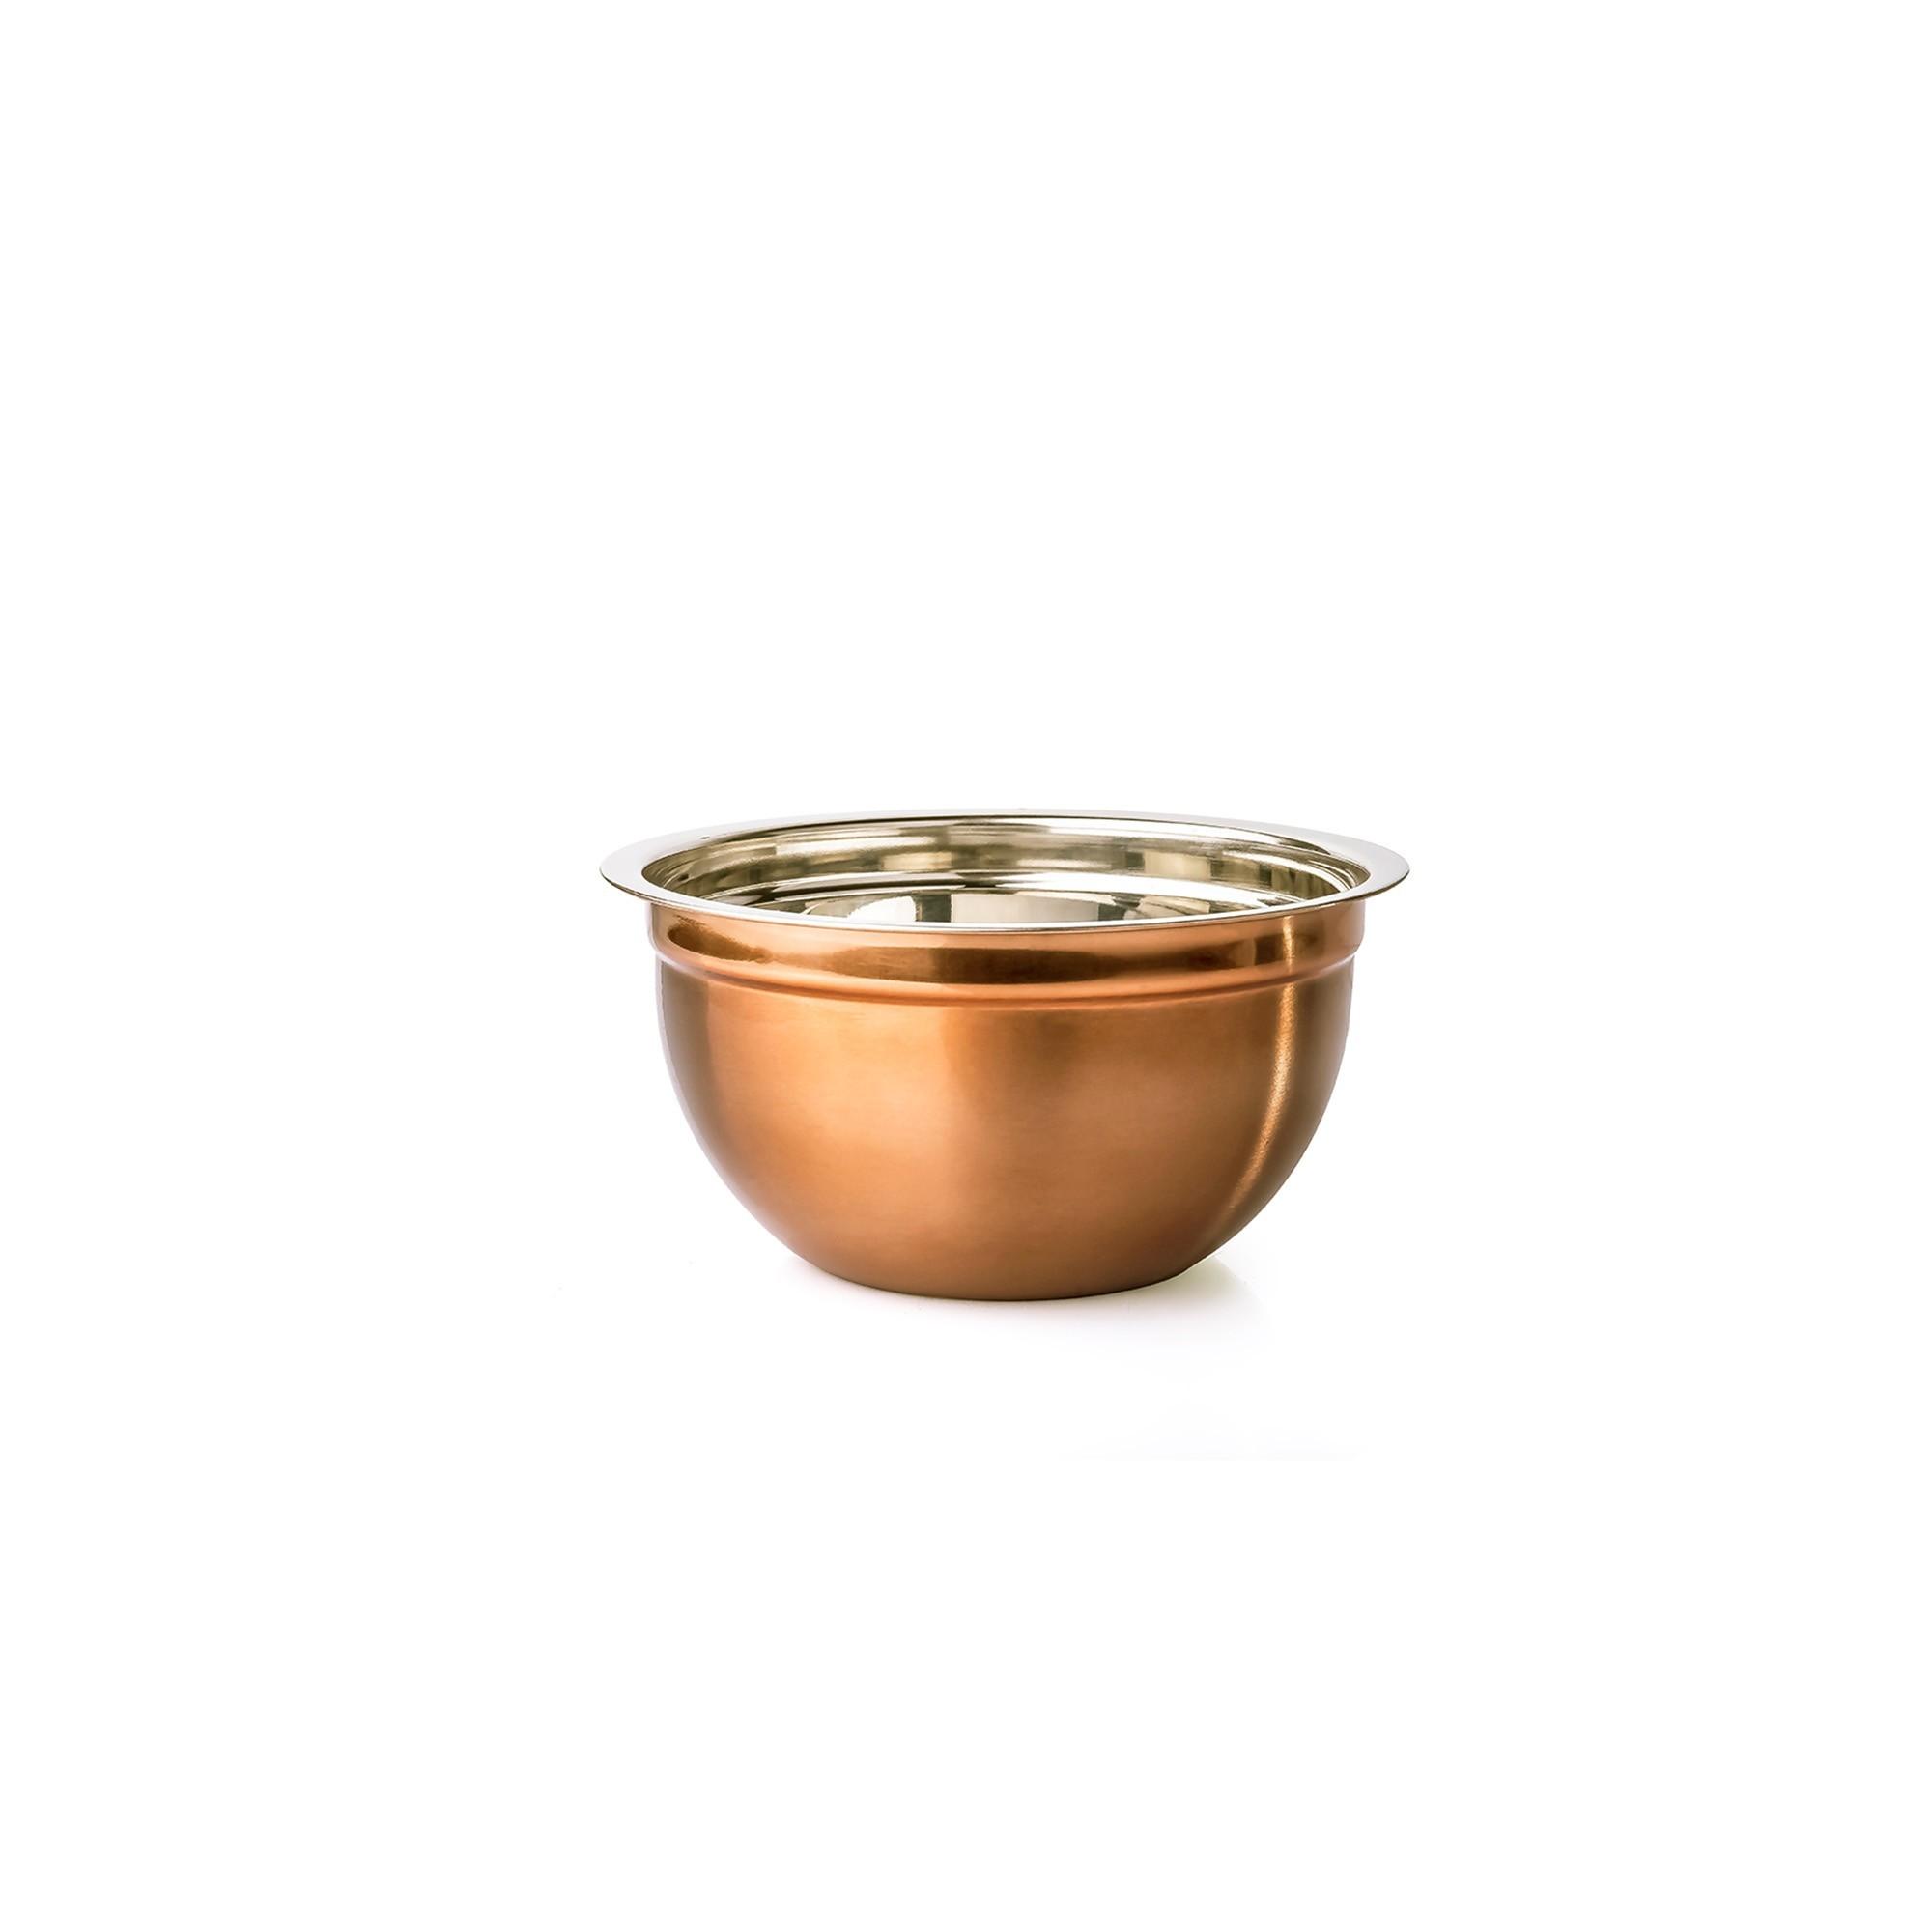 Kit 2 Bowl Cobre Inox Attuale